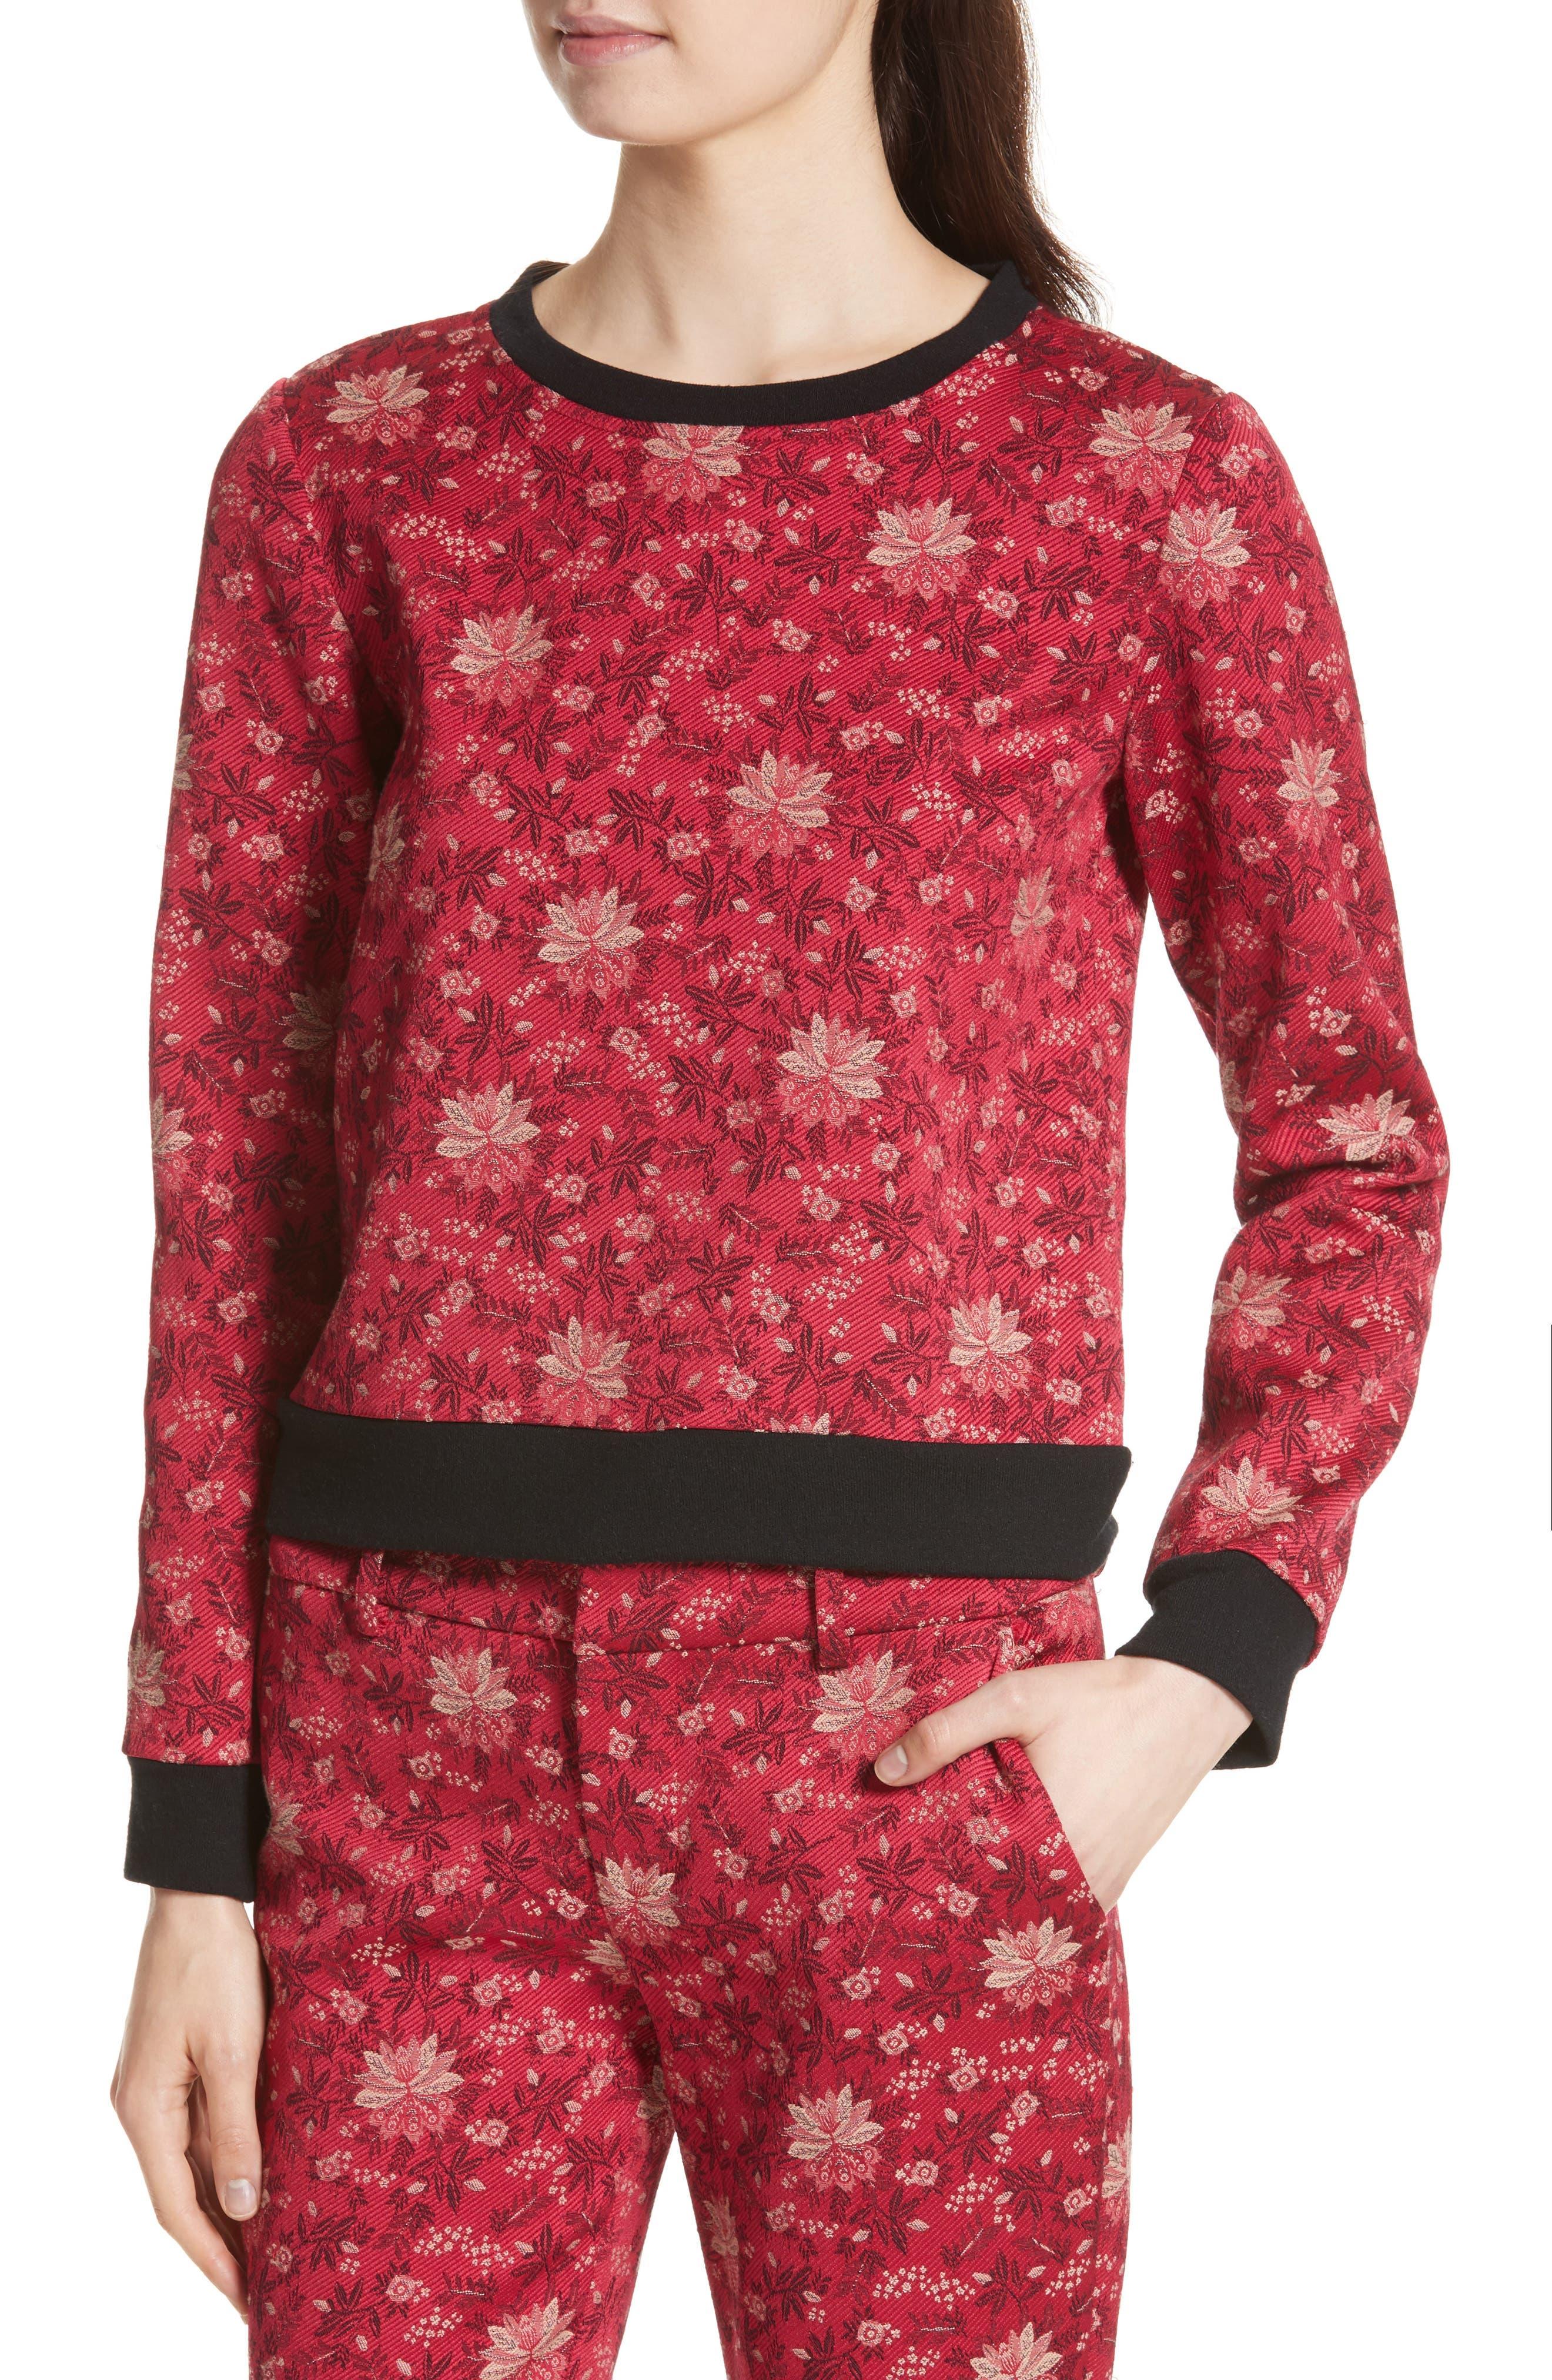 Marylou Floral Jacquard Sweatshirt,                             Alternate thumbnail 4, color,                             650